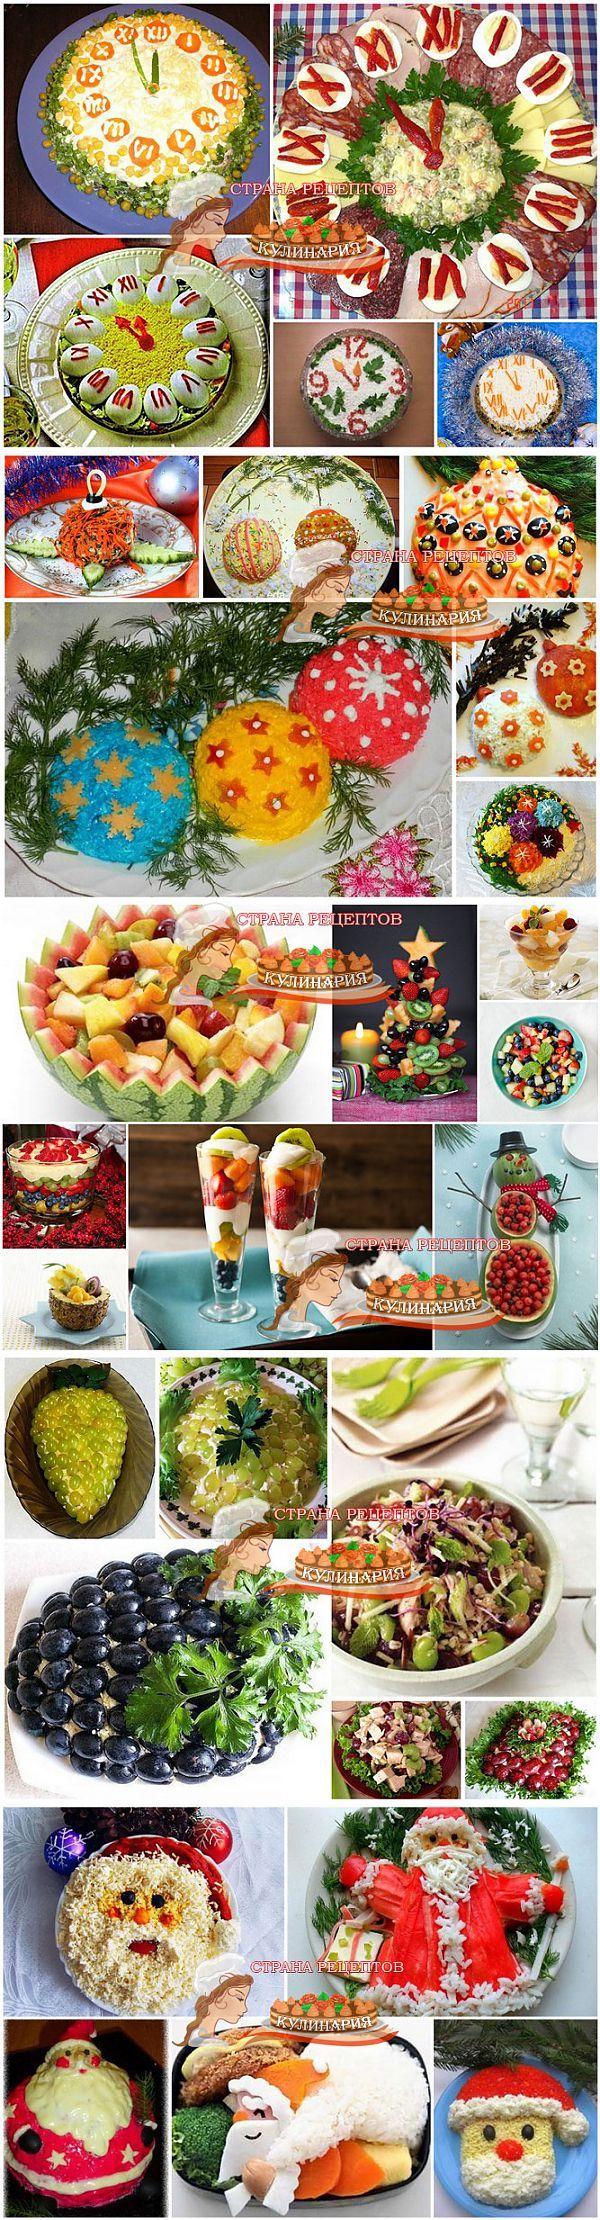 recepty-kulinariya.ru